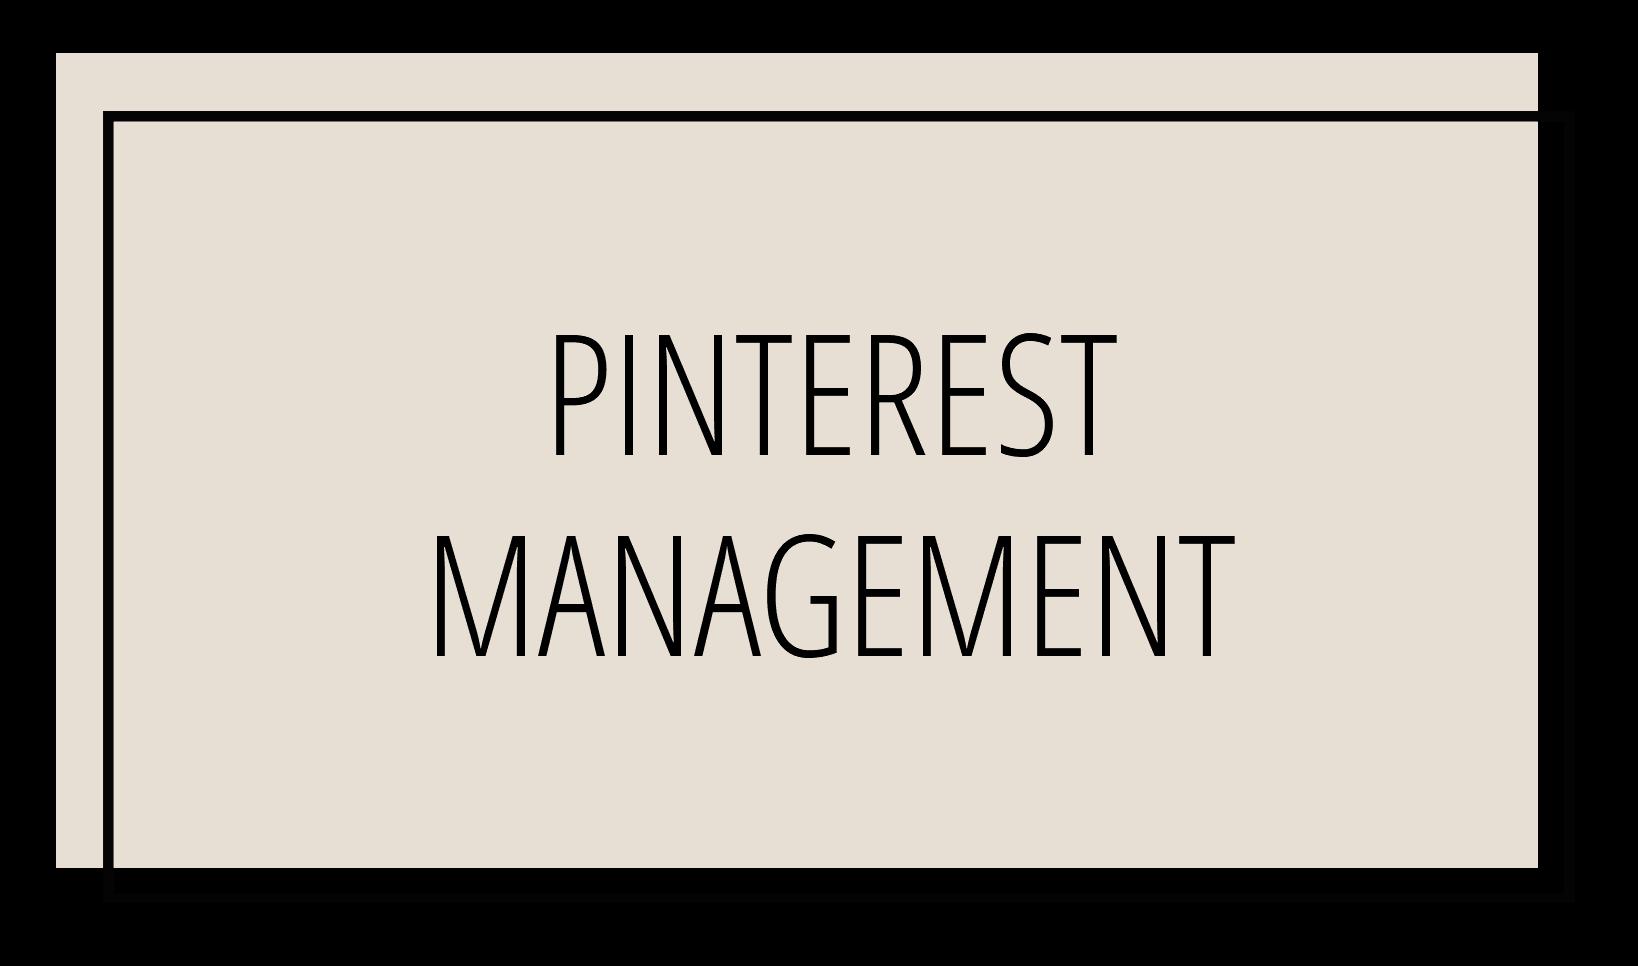 PinterestManagement.png